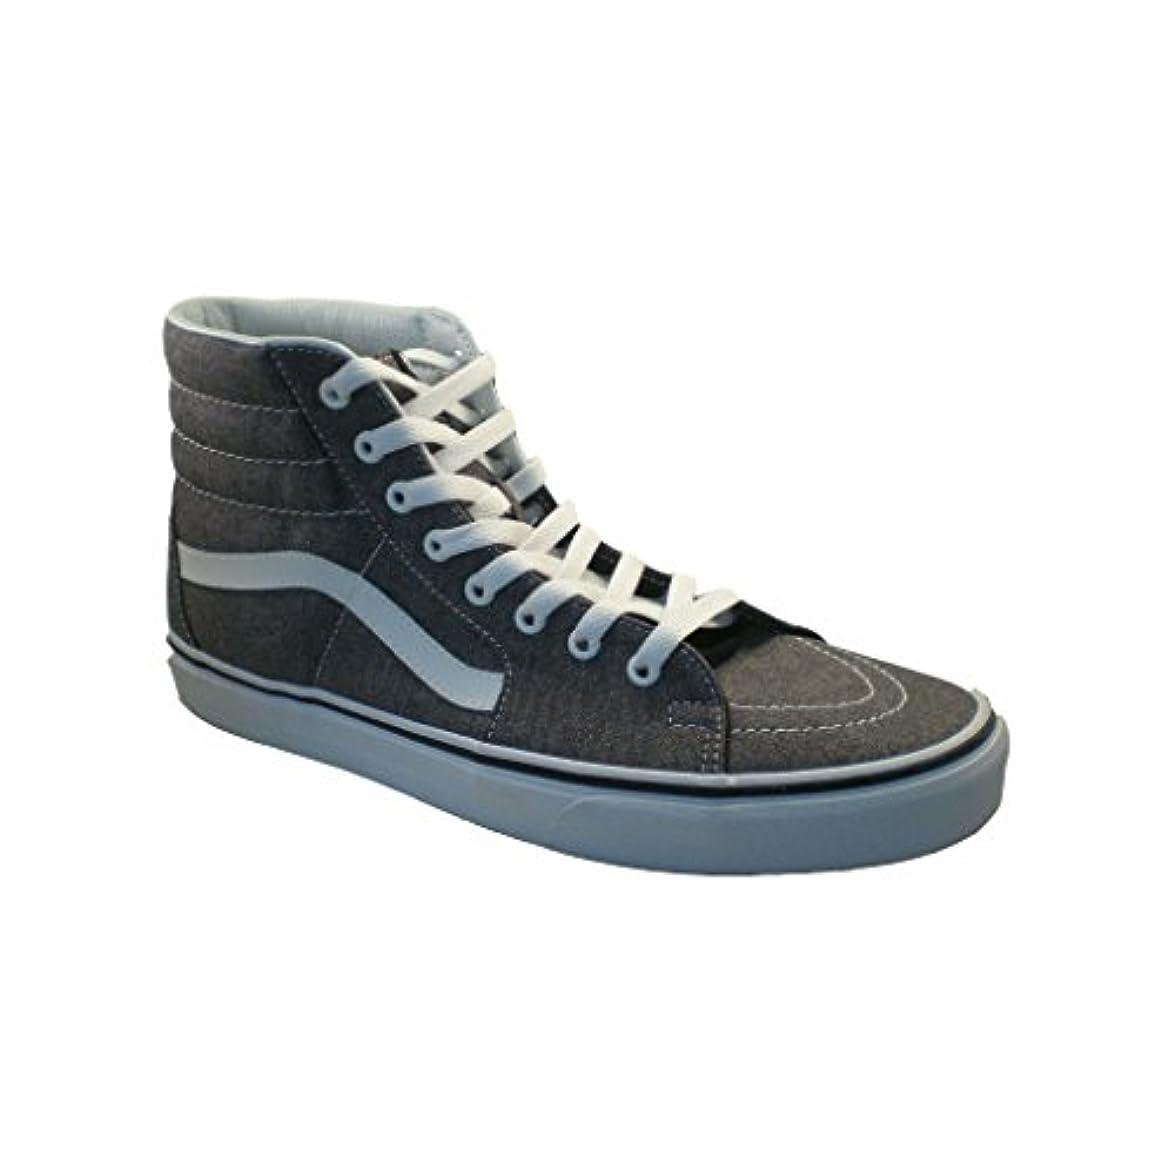 Vans Sk8-hi Sneakers Alti Unisex-adulto